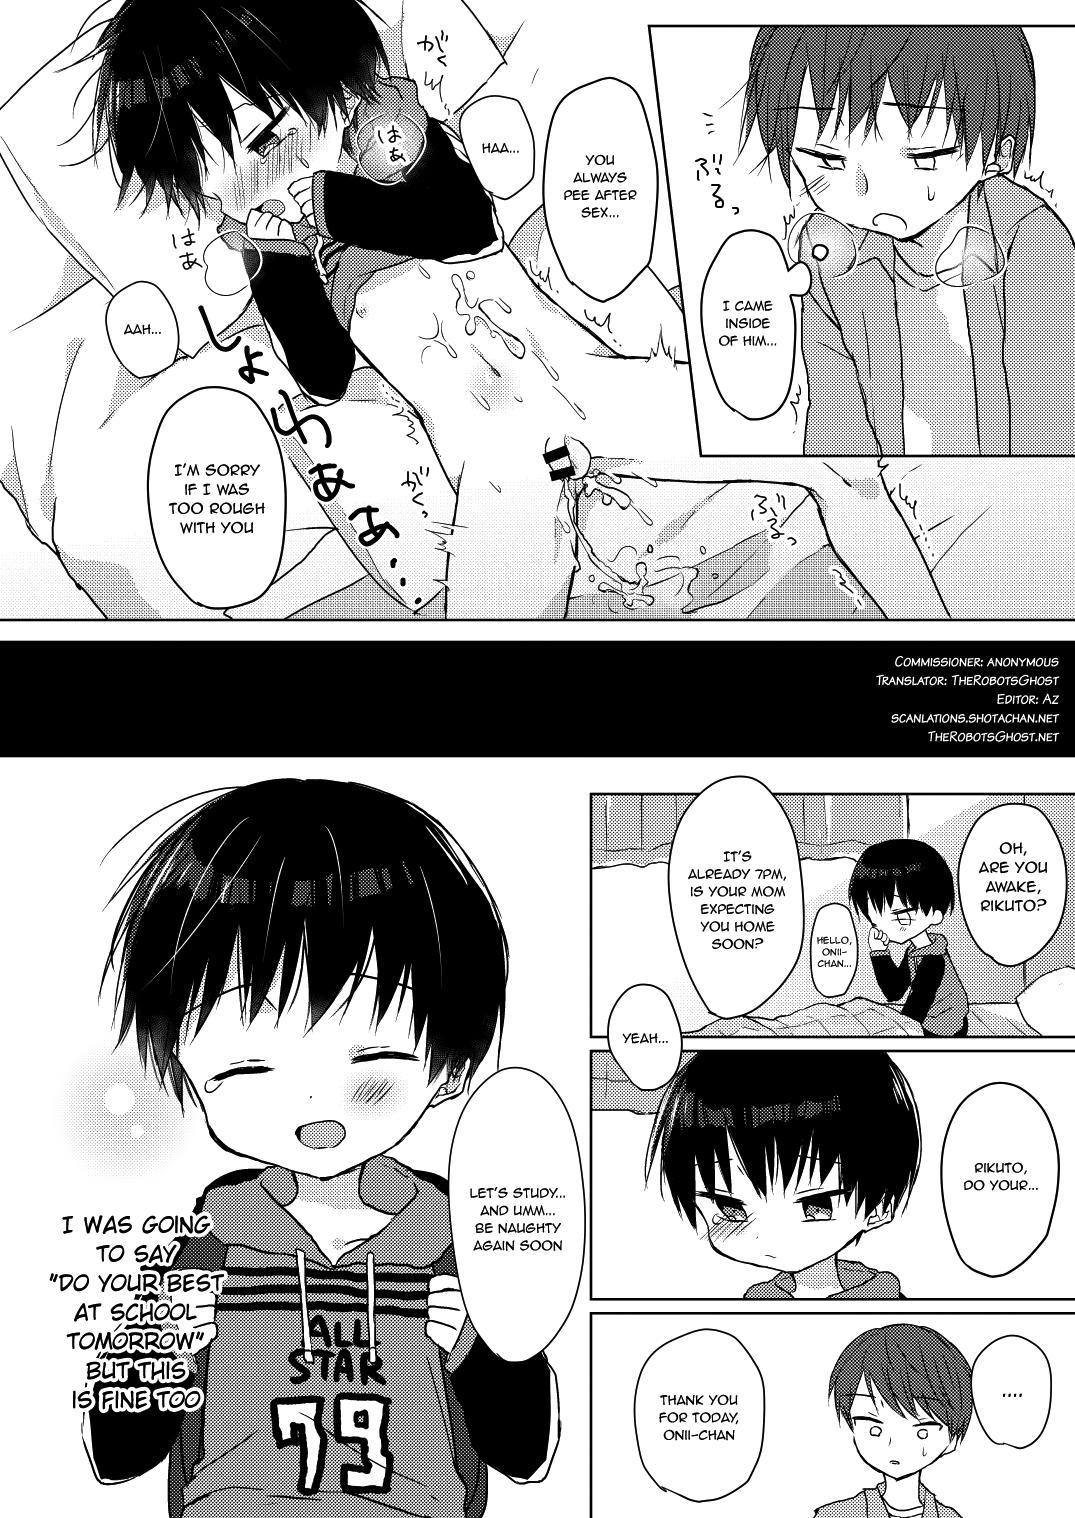 Futoukou Shota no Manga 12